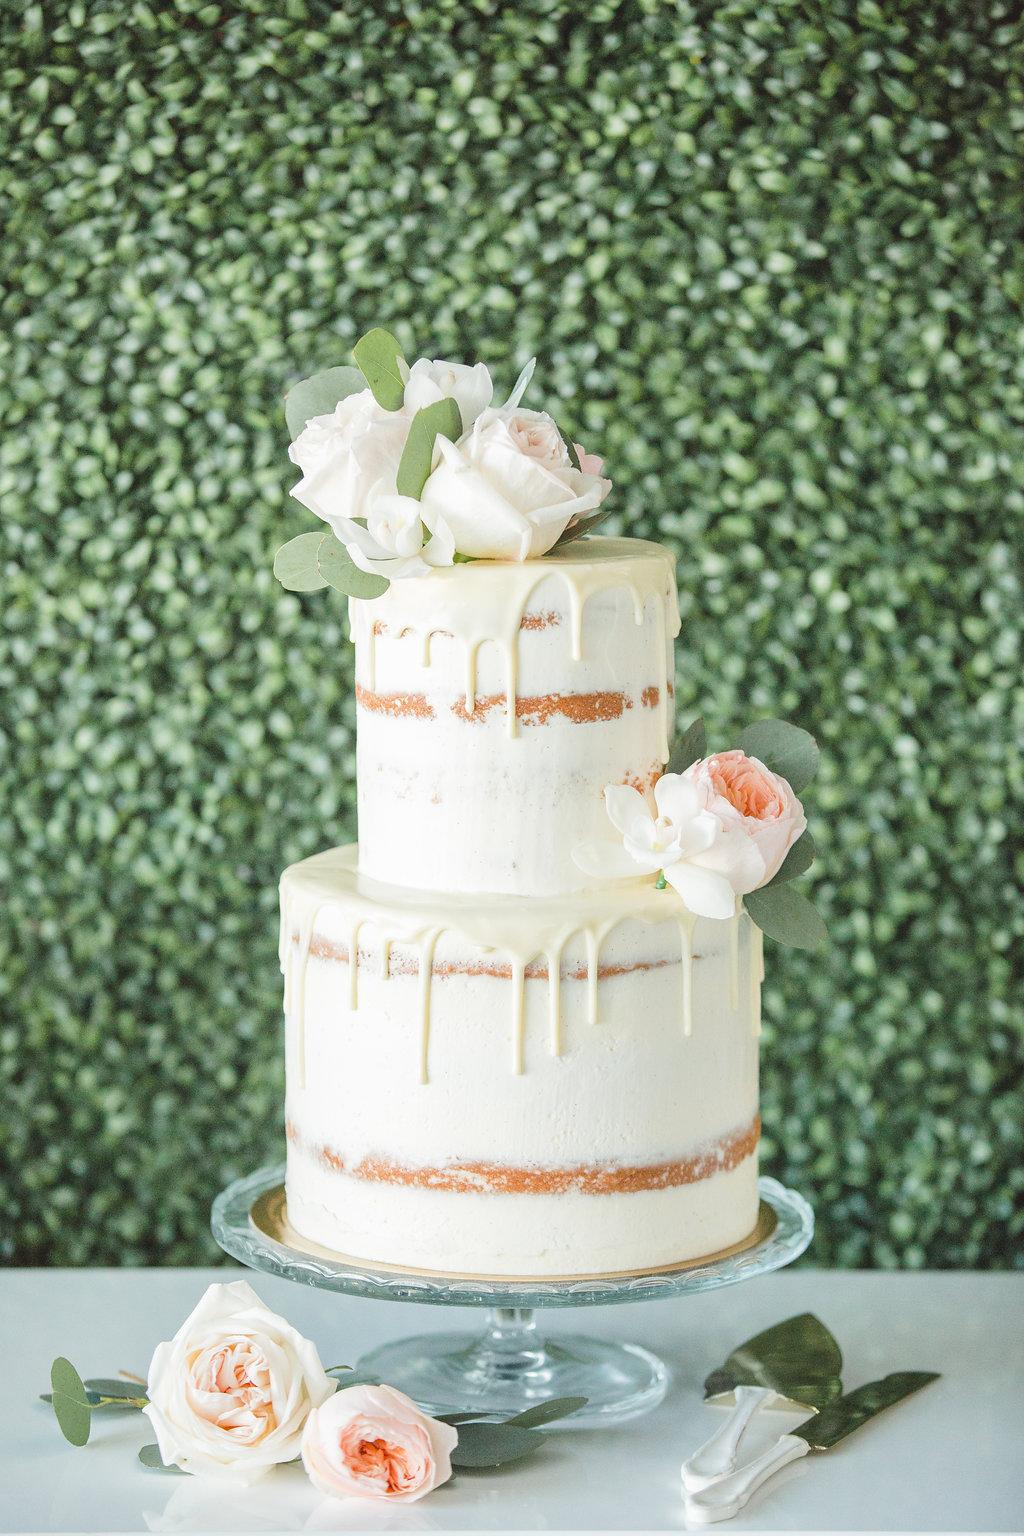 naked drip wedding cake - photo by Parrish House Photos http://ruffledblog.com/hawaiian-inspired-bridal-shower